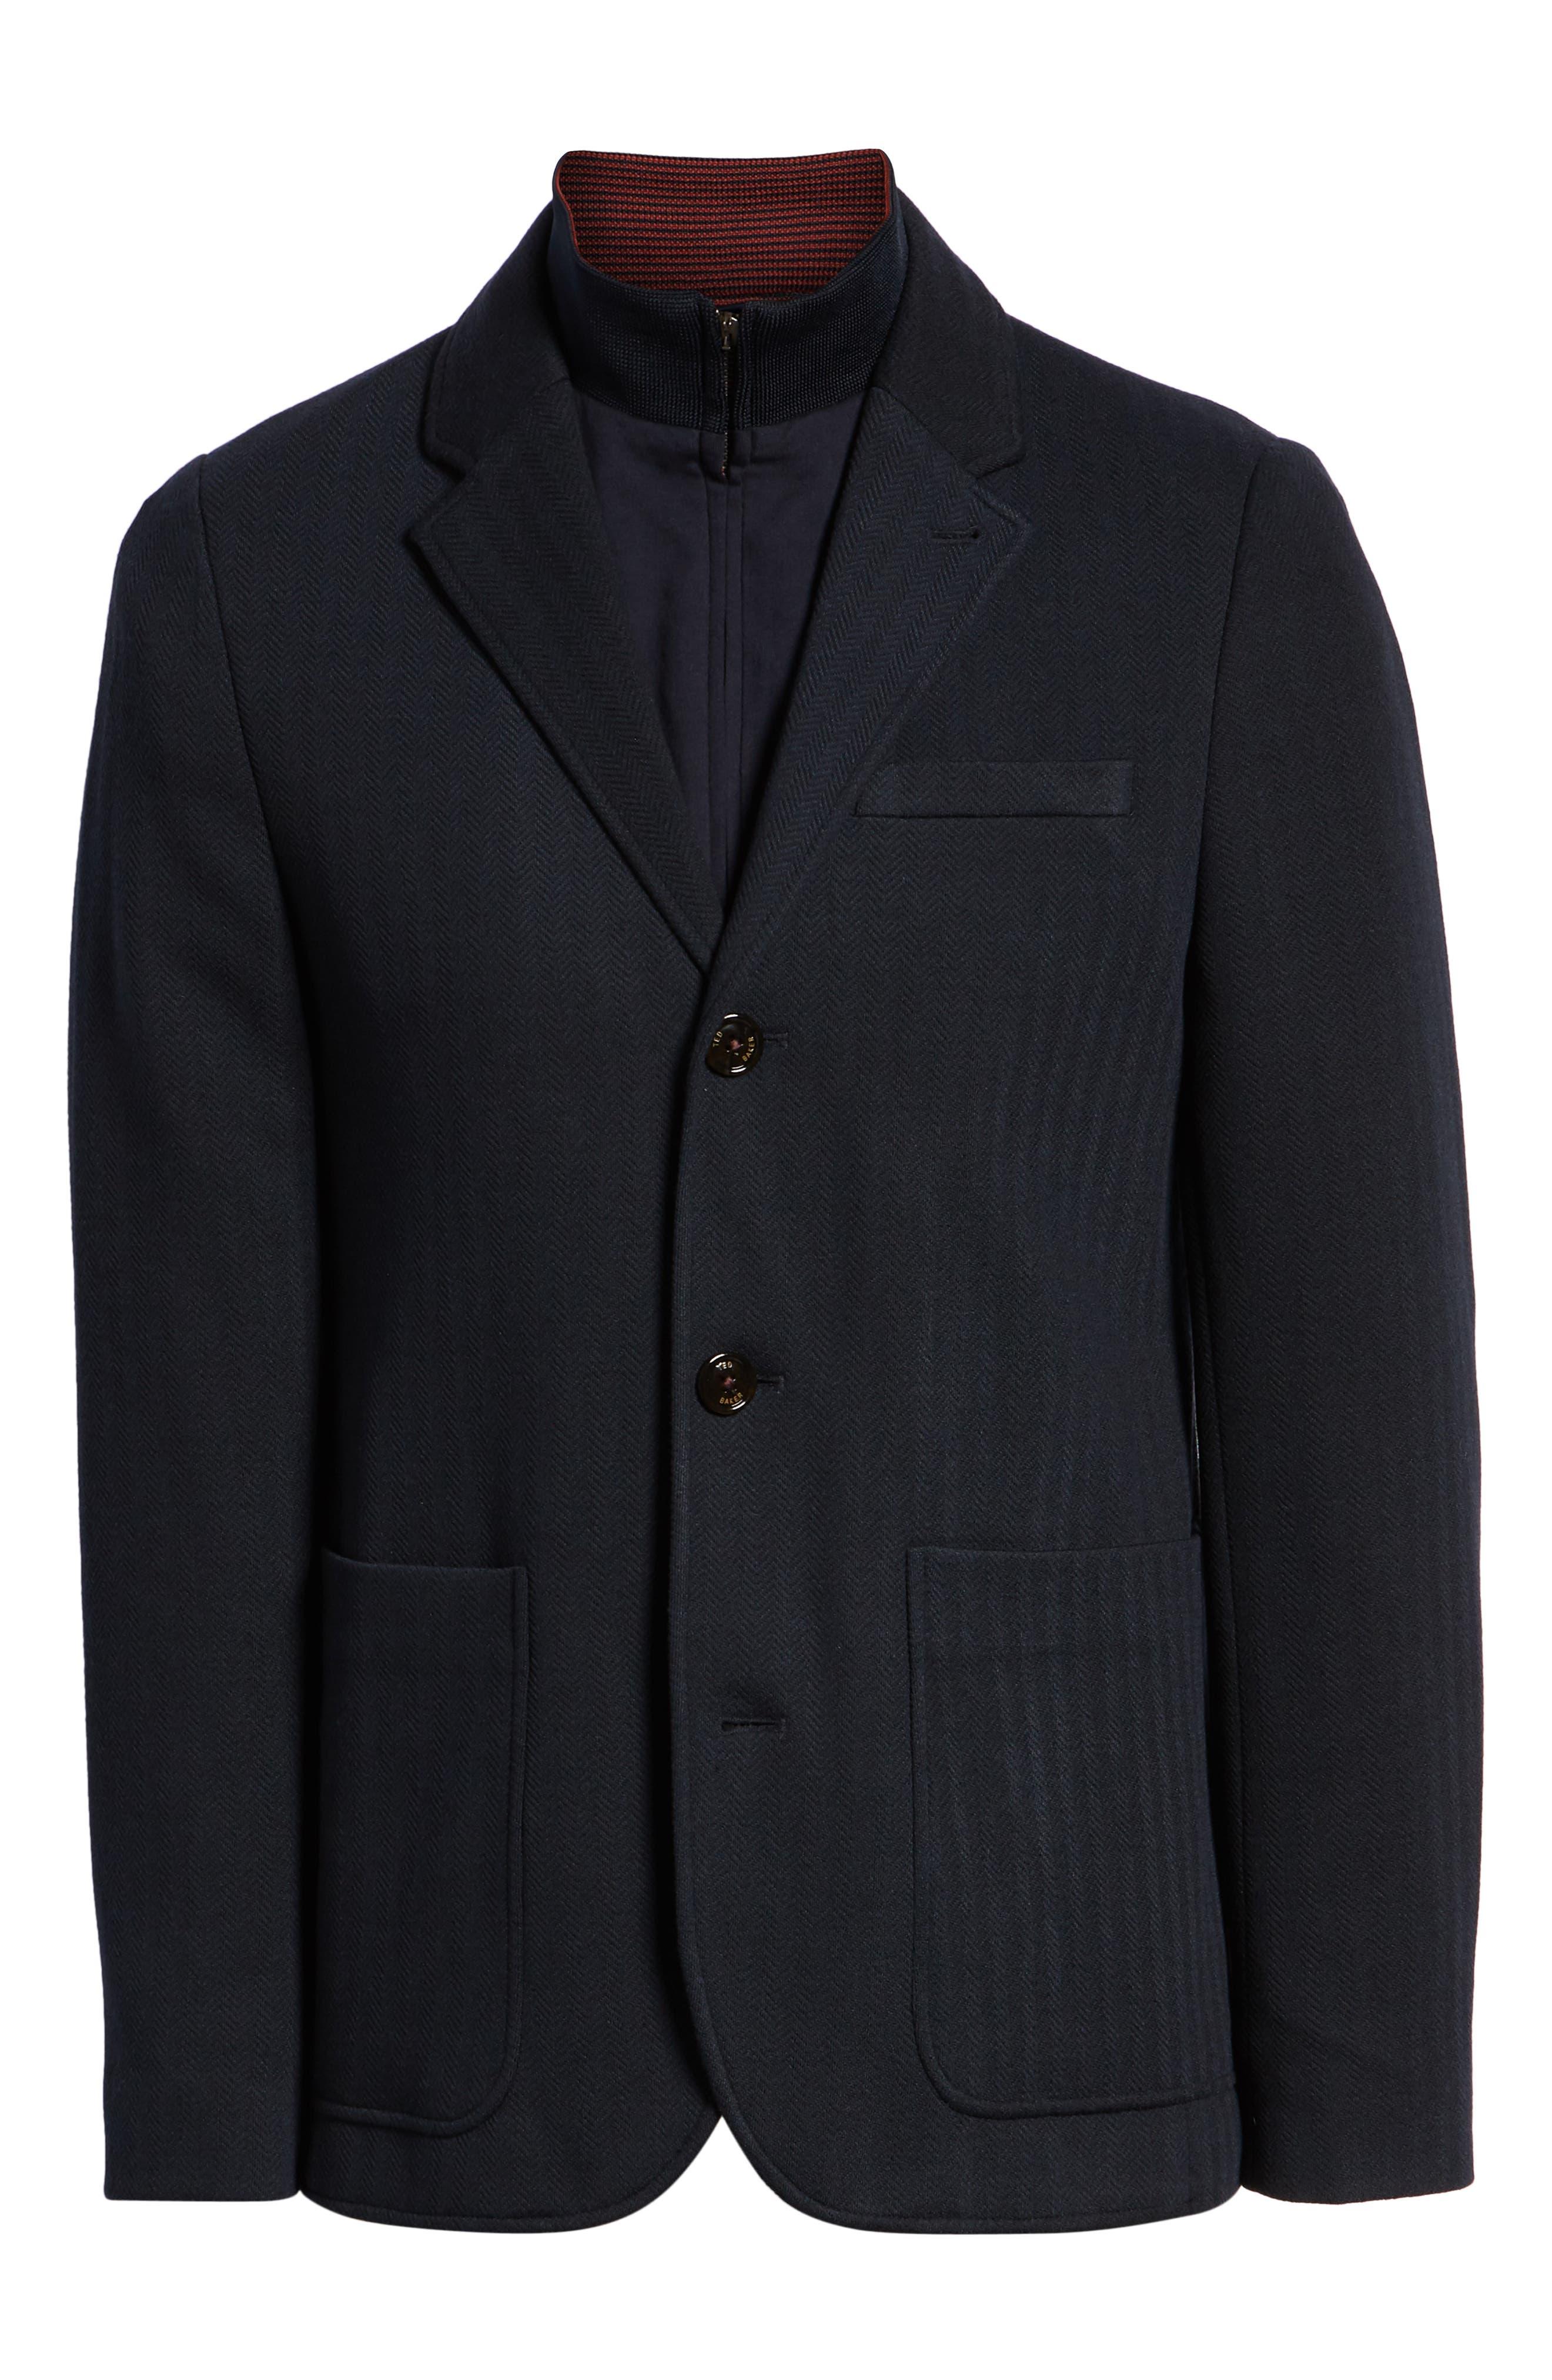 Glenny Slim Fit Layered Look Blazer,                             Alternate thumbnail 5, color,                             NAVY